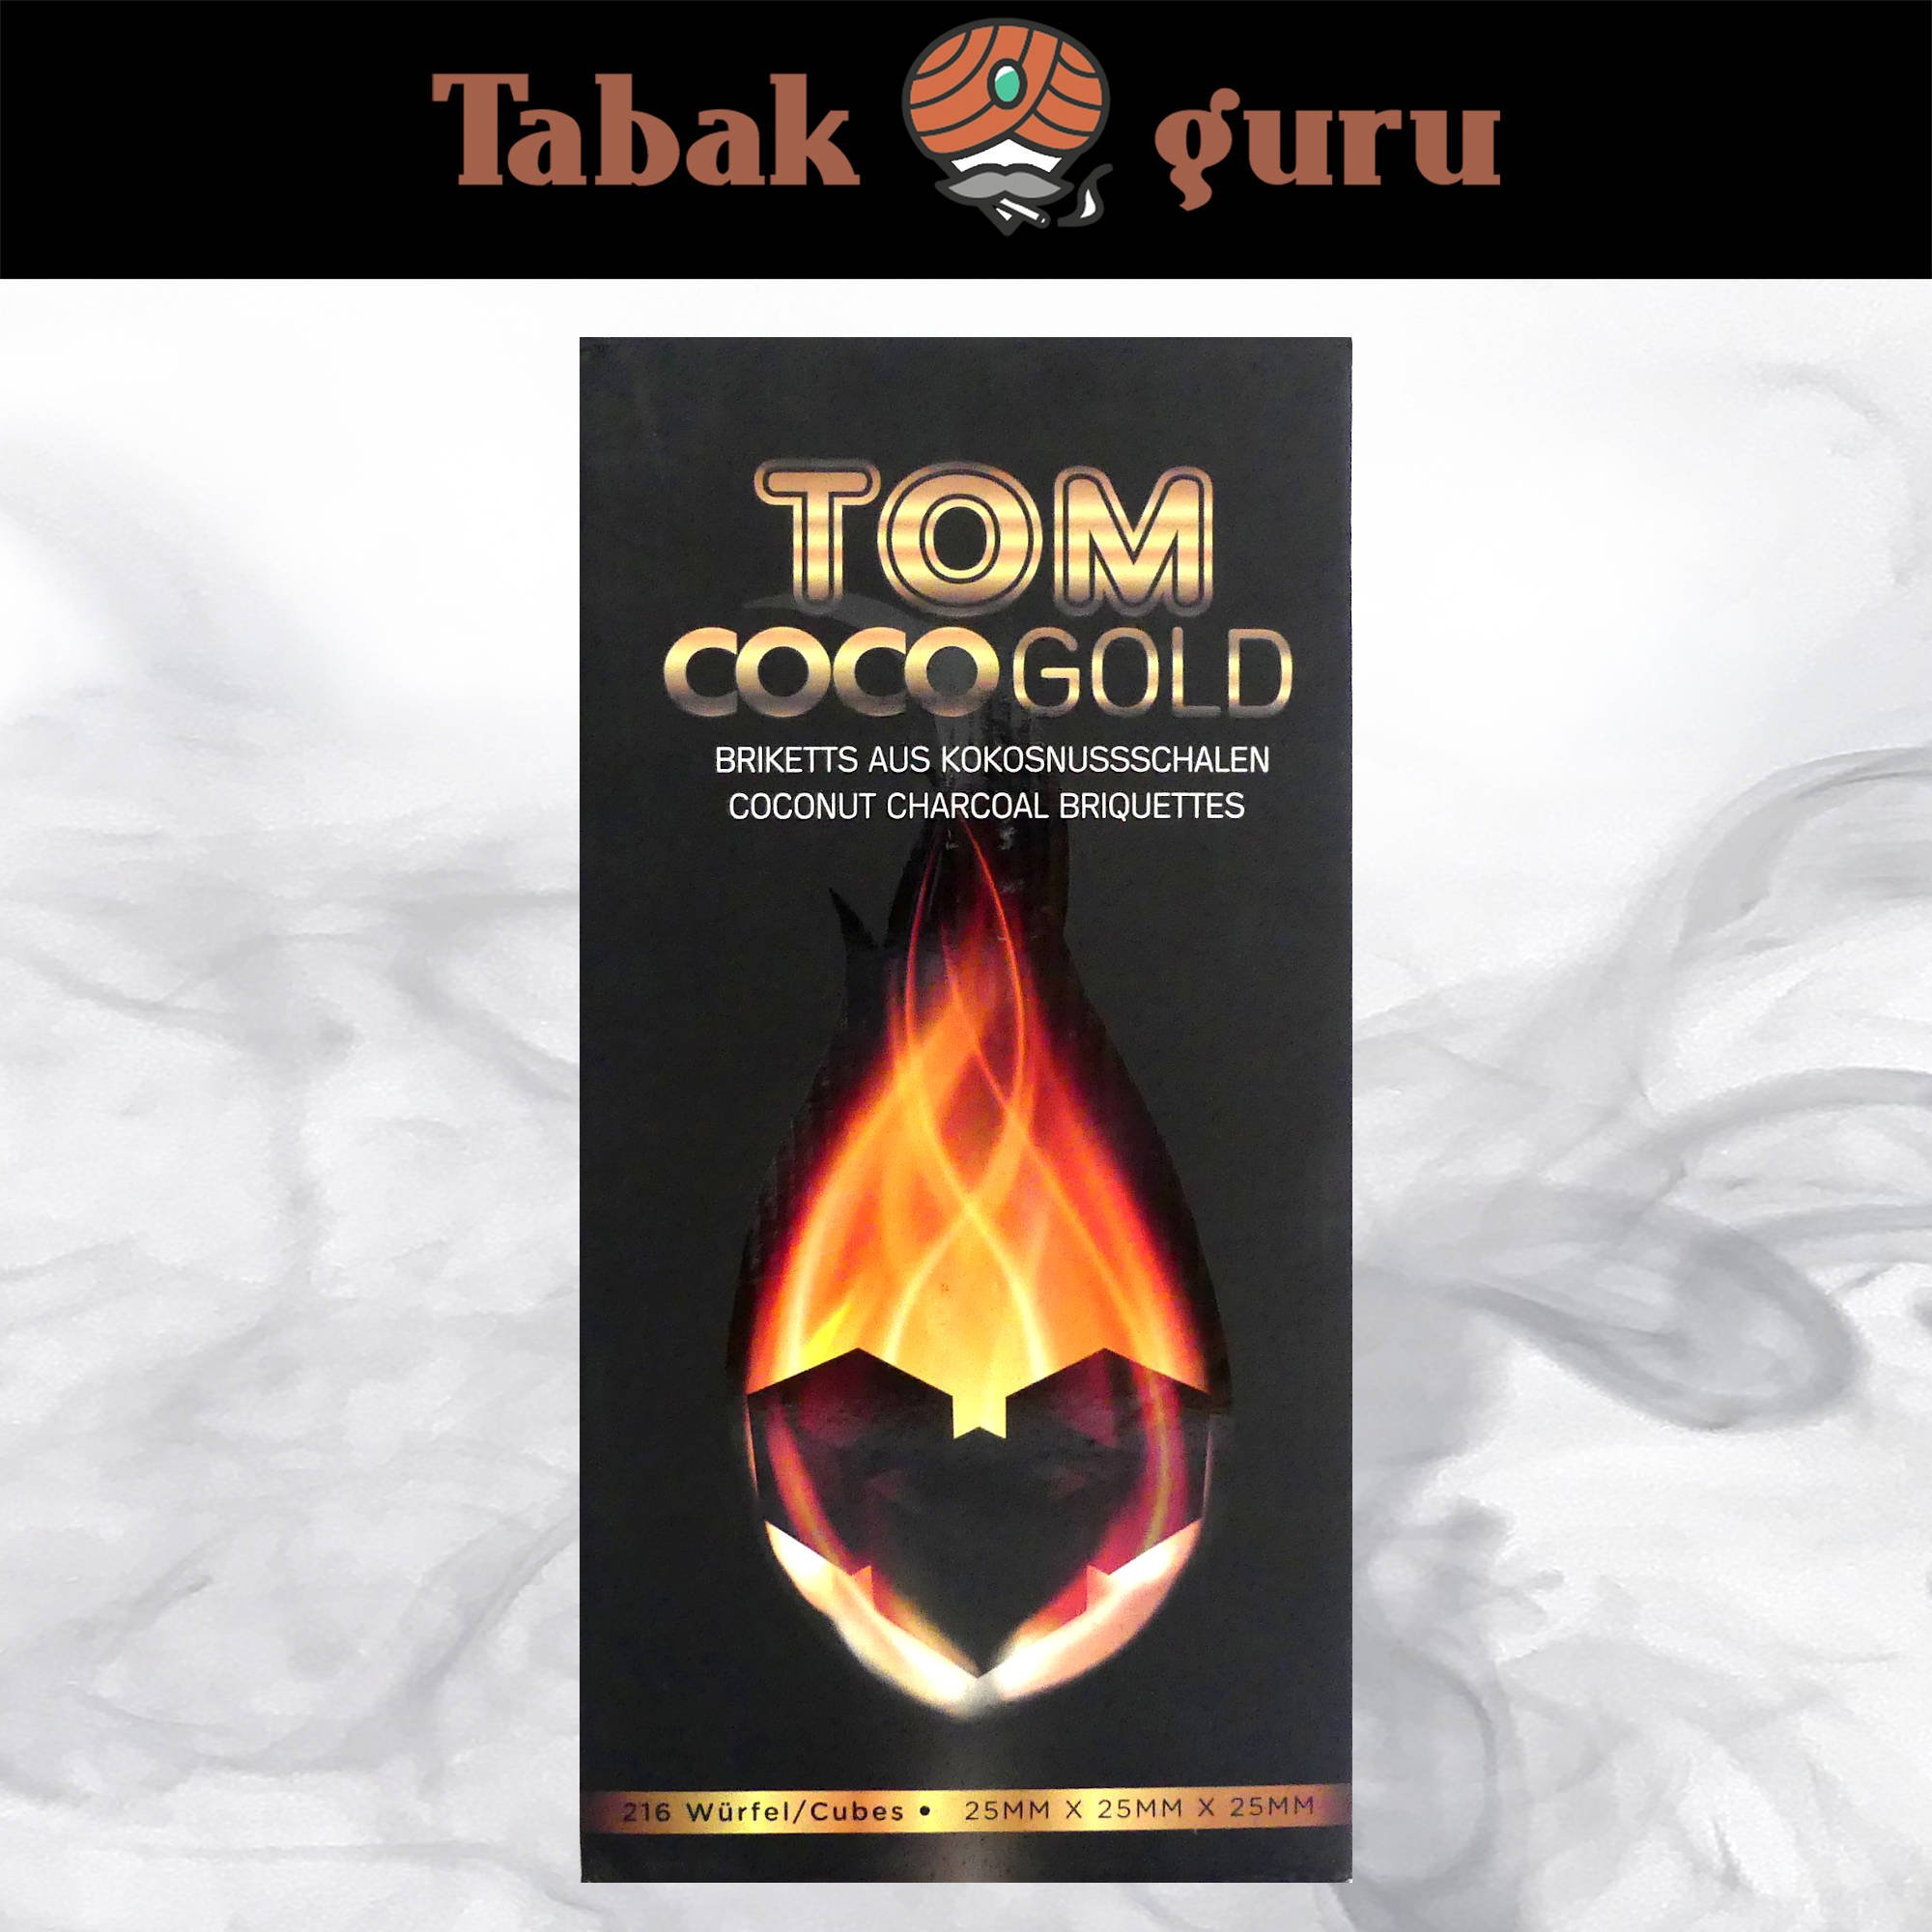 Tom Cococha CocoGold Shishakohle 3 kg / 216 Stück